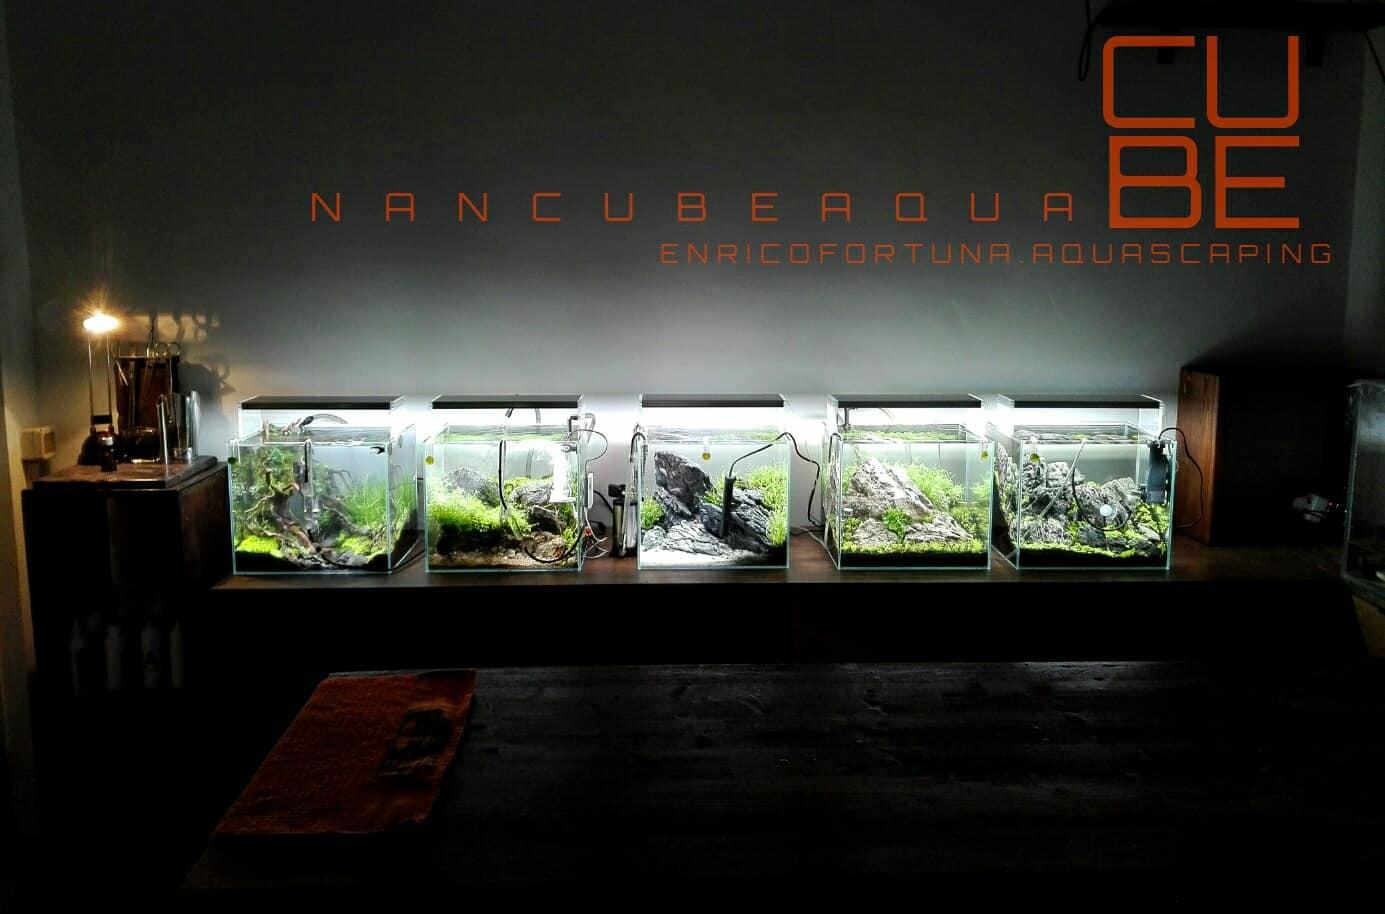 159 Die Interzoo 2018 - Das my-fish Special 2